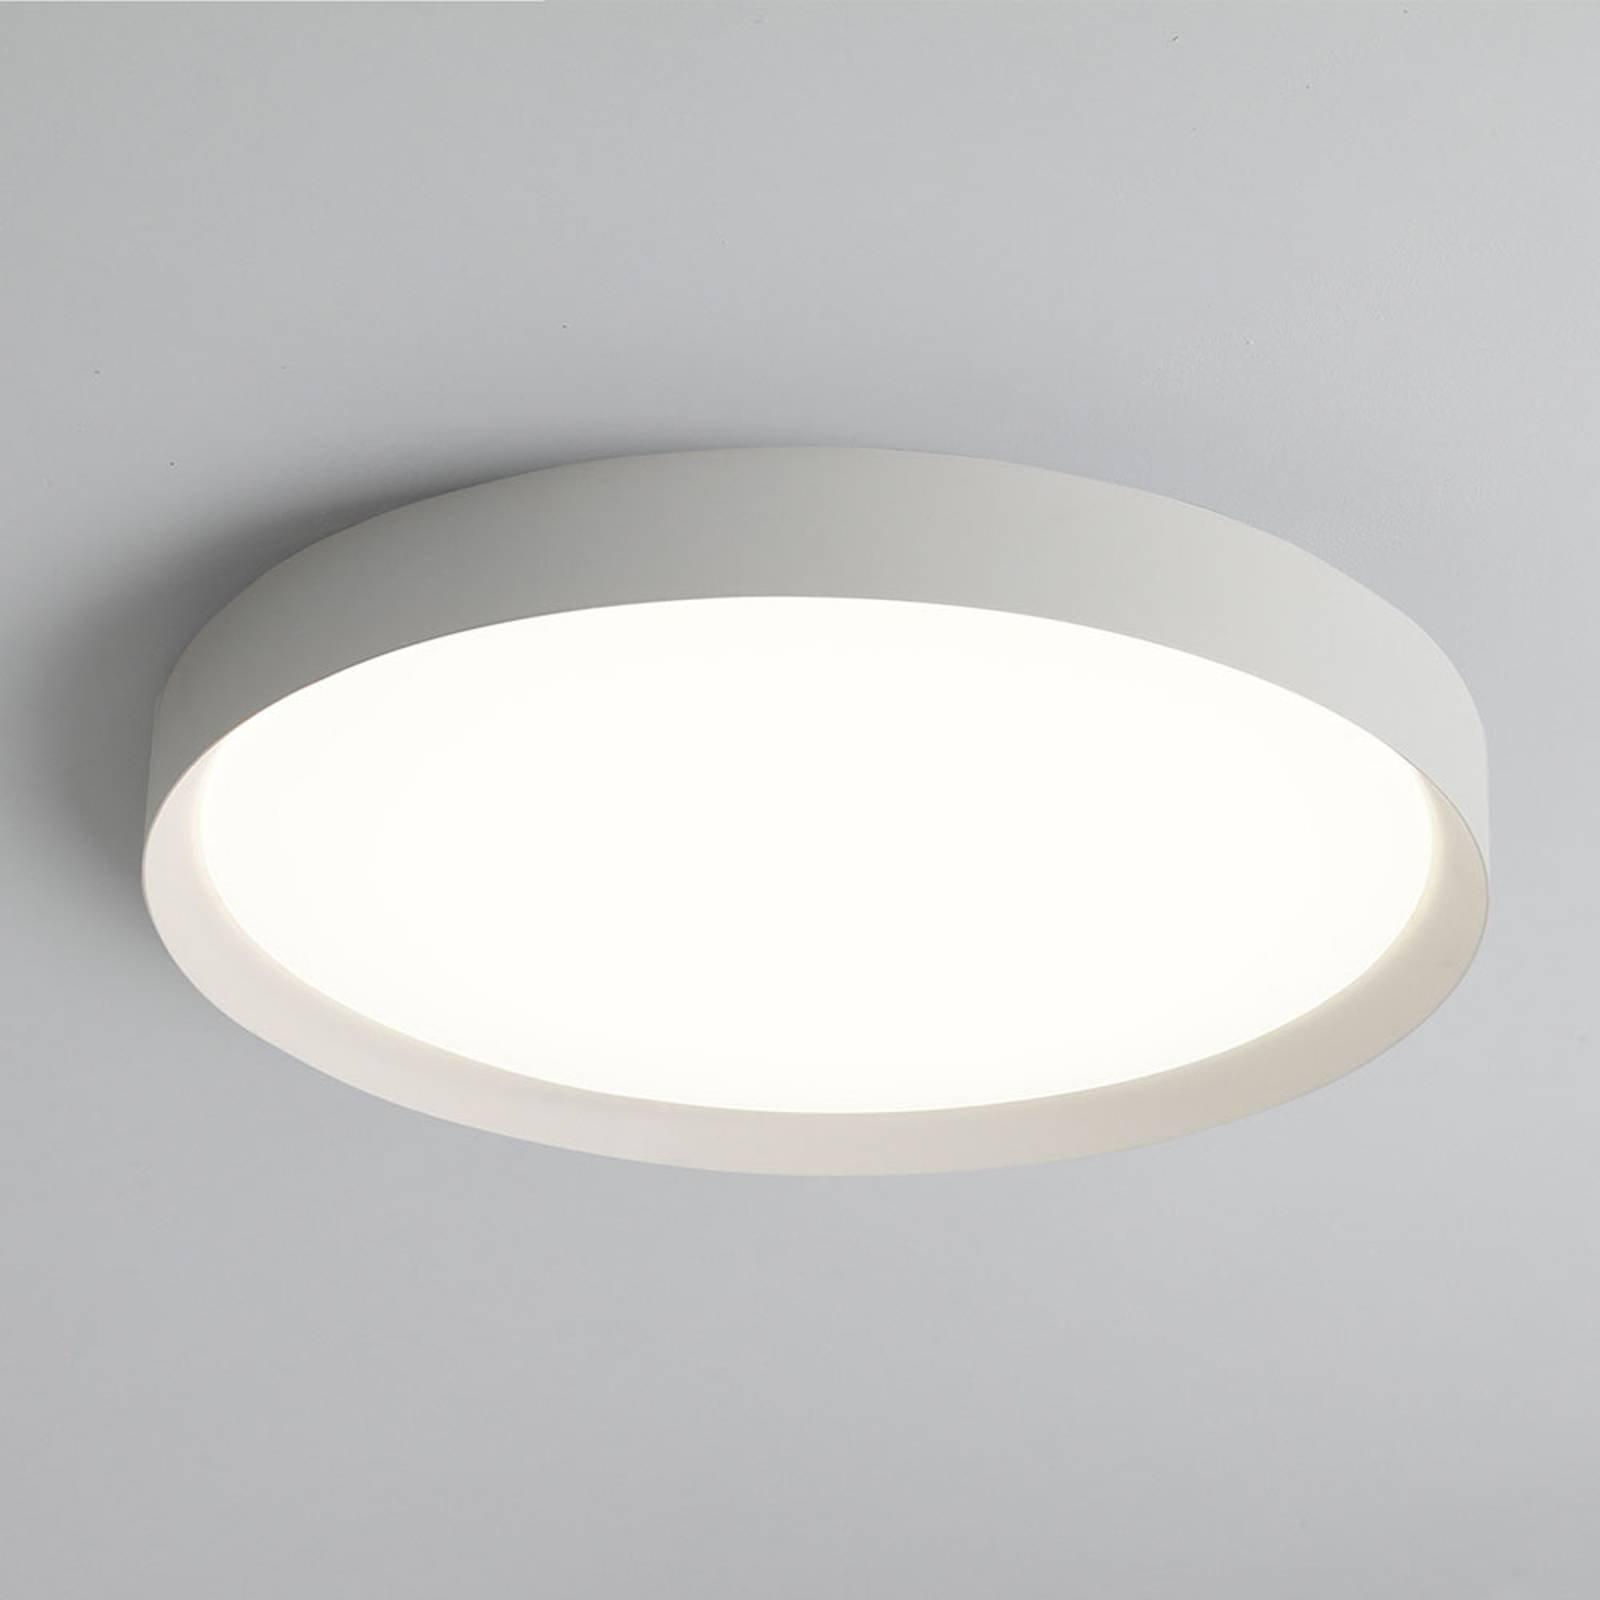 LED-taklampe Minsk DALI Ø 60 cm Casambi hvit